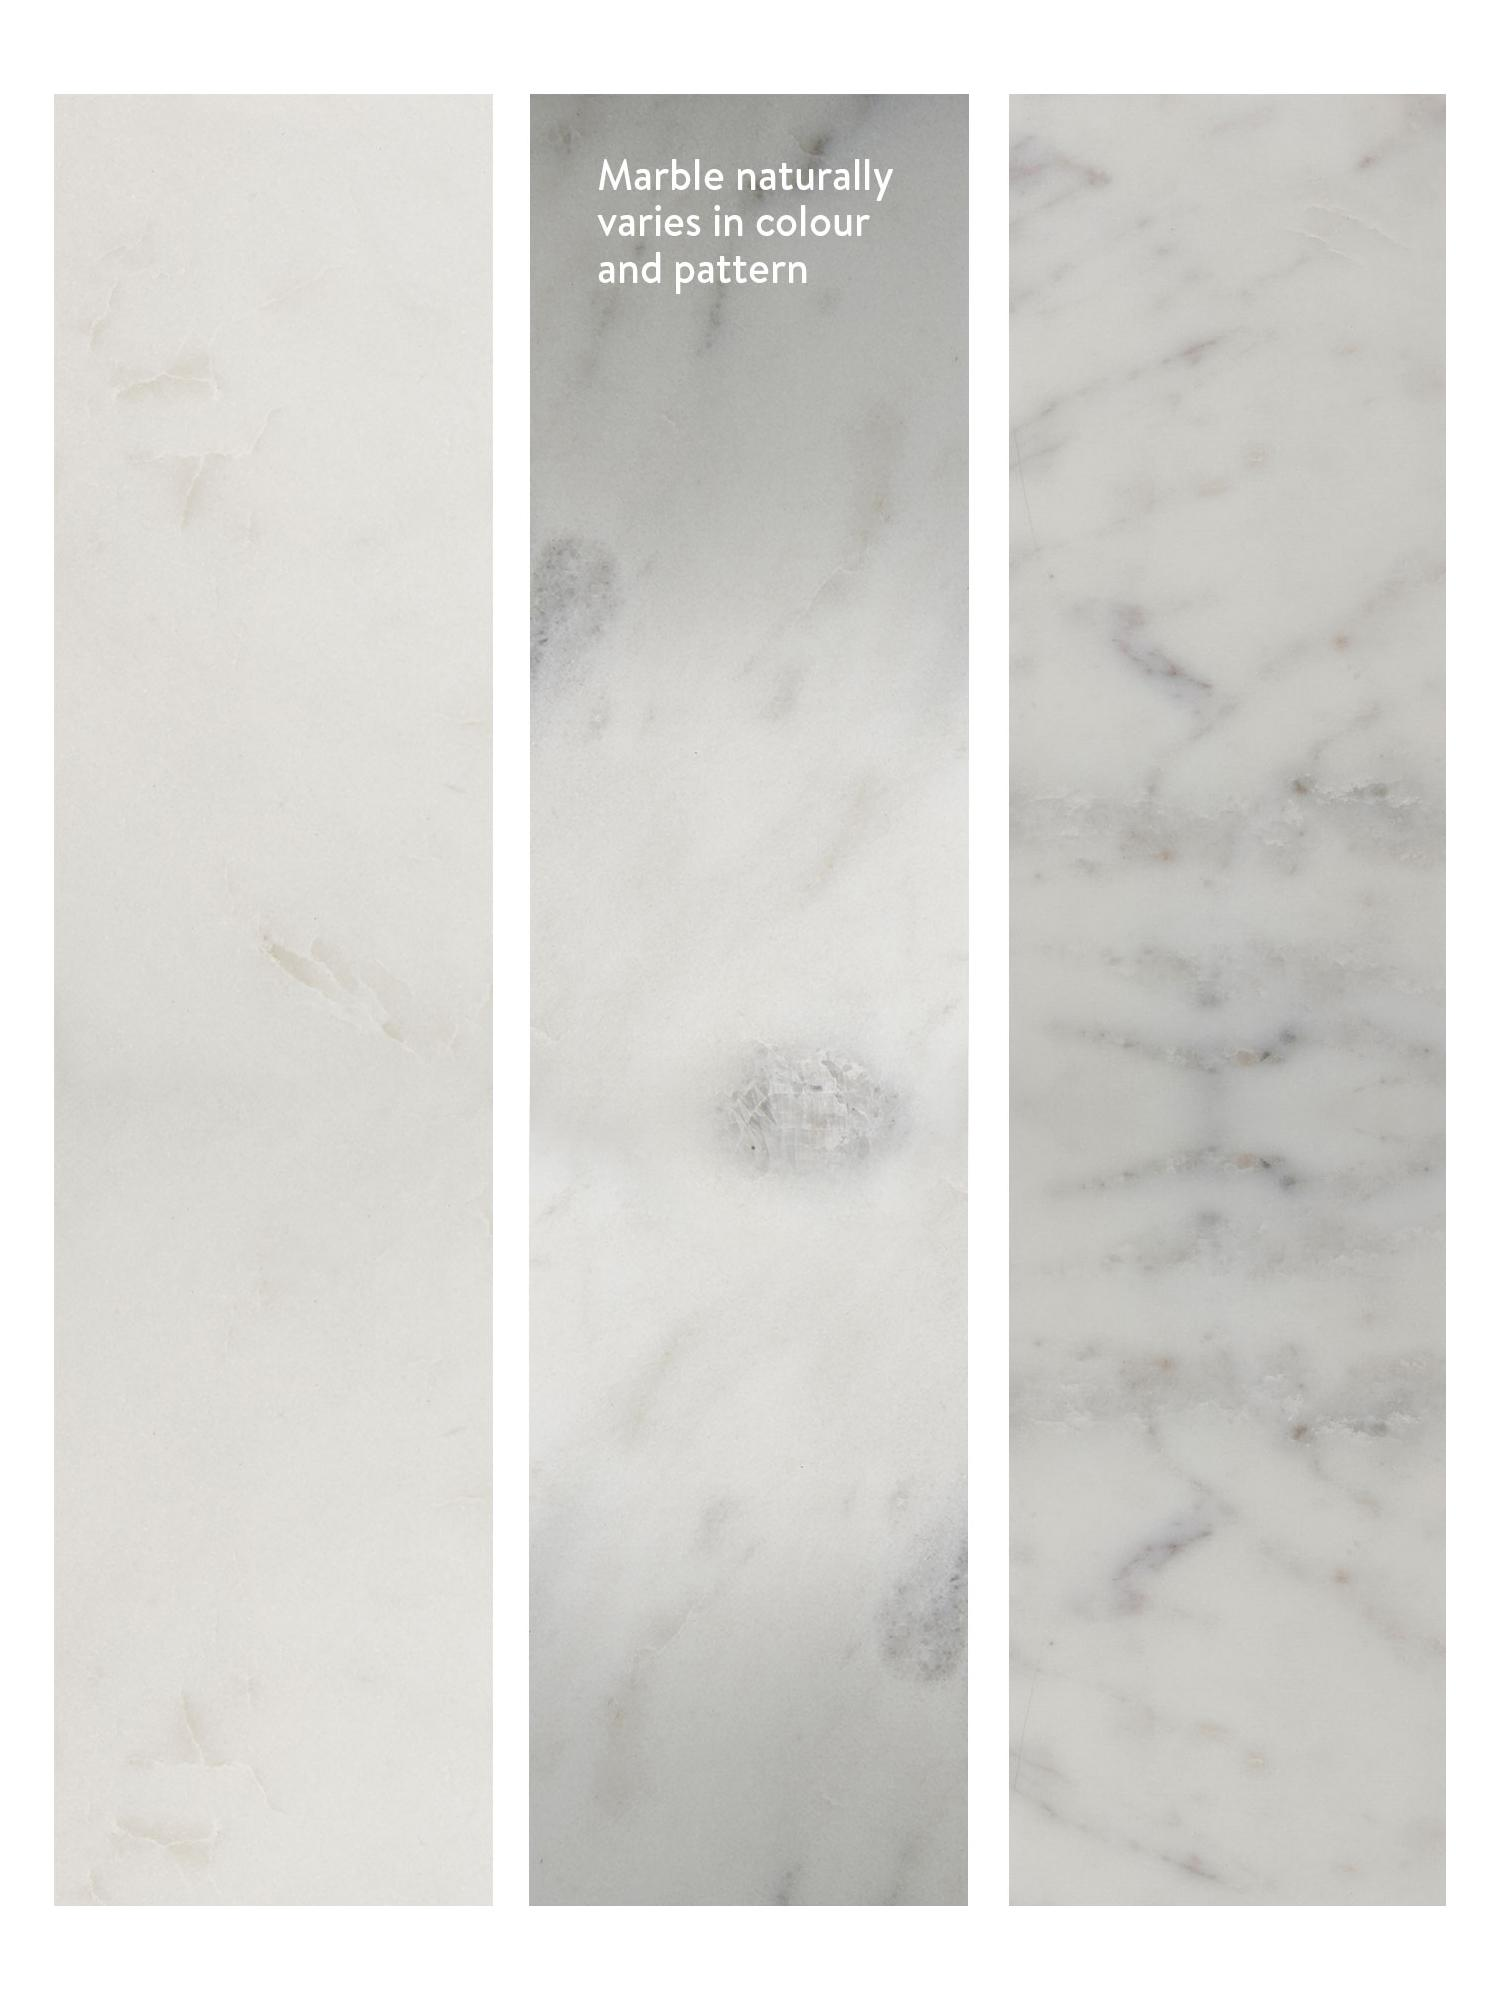 Marmor-Couchtisch Alys, Tischplatte: Marmor, Gestell: Metall, beschichtet, Weisser Marmor, Goldfarben, 120 x 35 cm